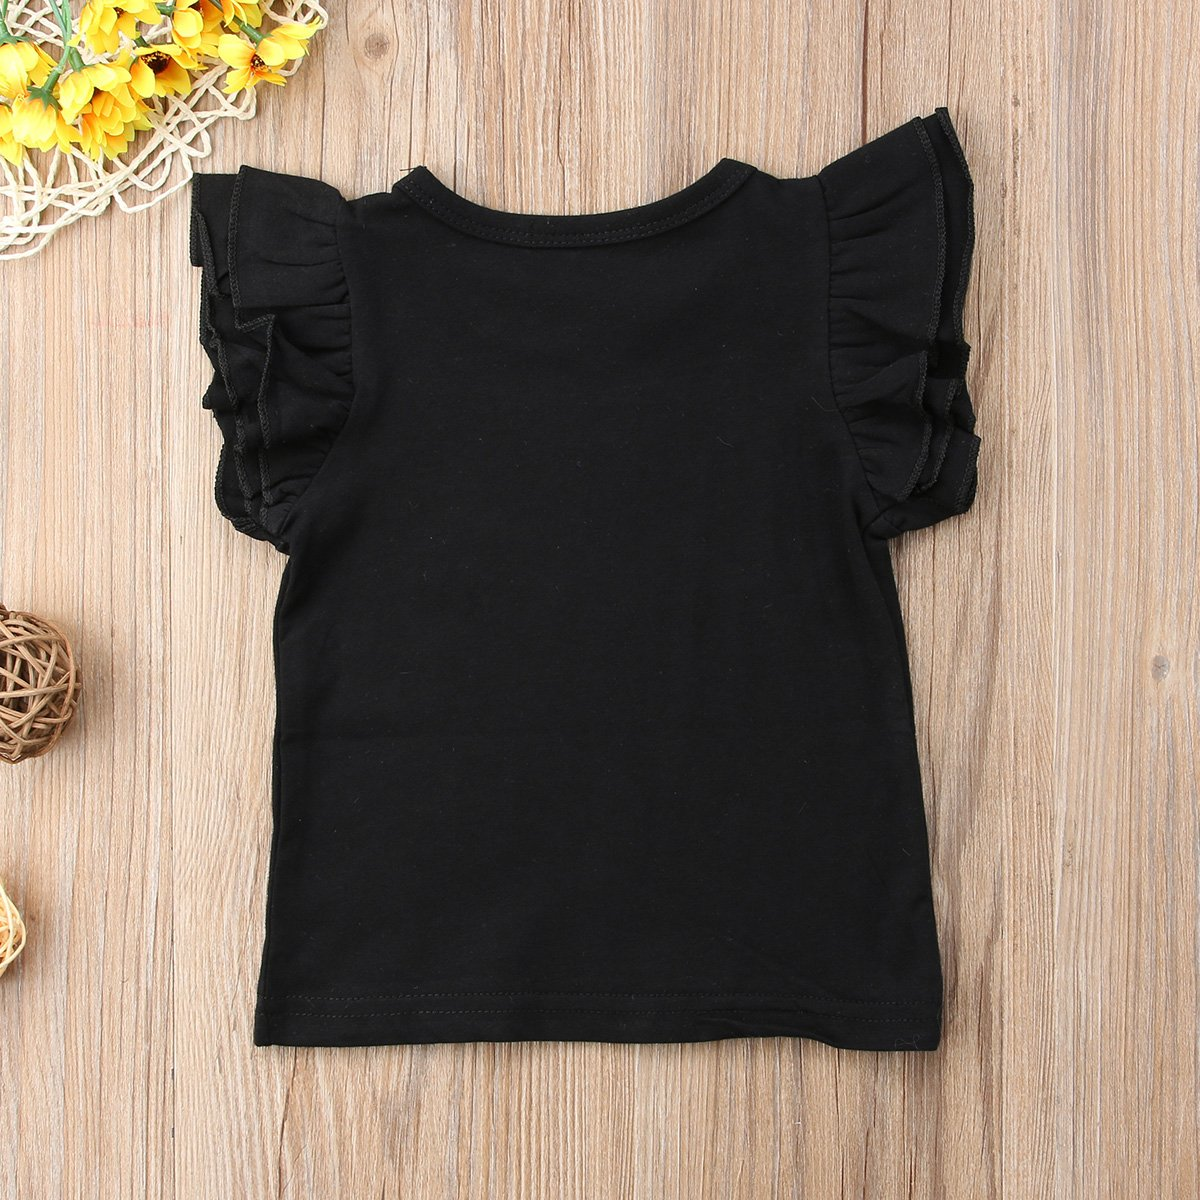 1304810390947 Mubineo Toddler Baby Girl Basic Plain Ruffle Sleeve Cotton T Shirts Tops  Tee Clothes